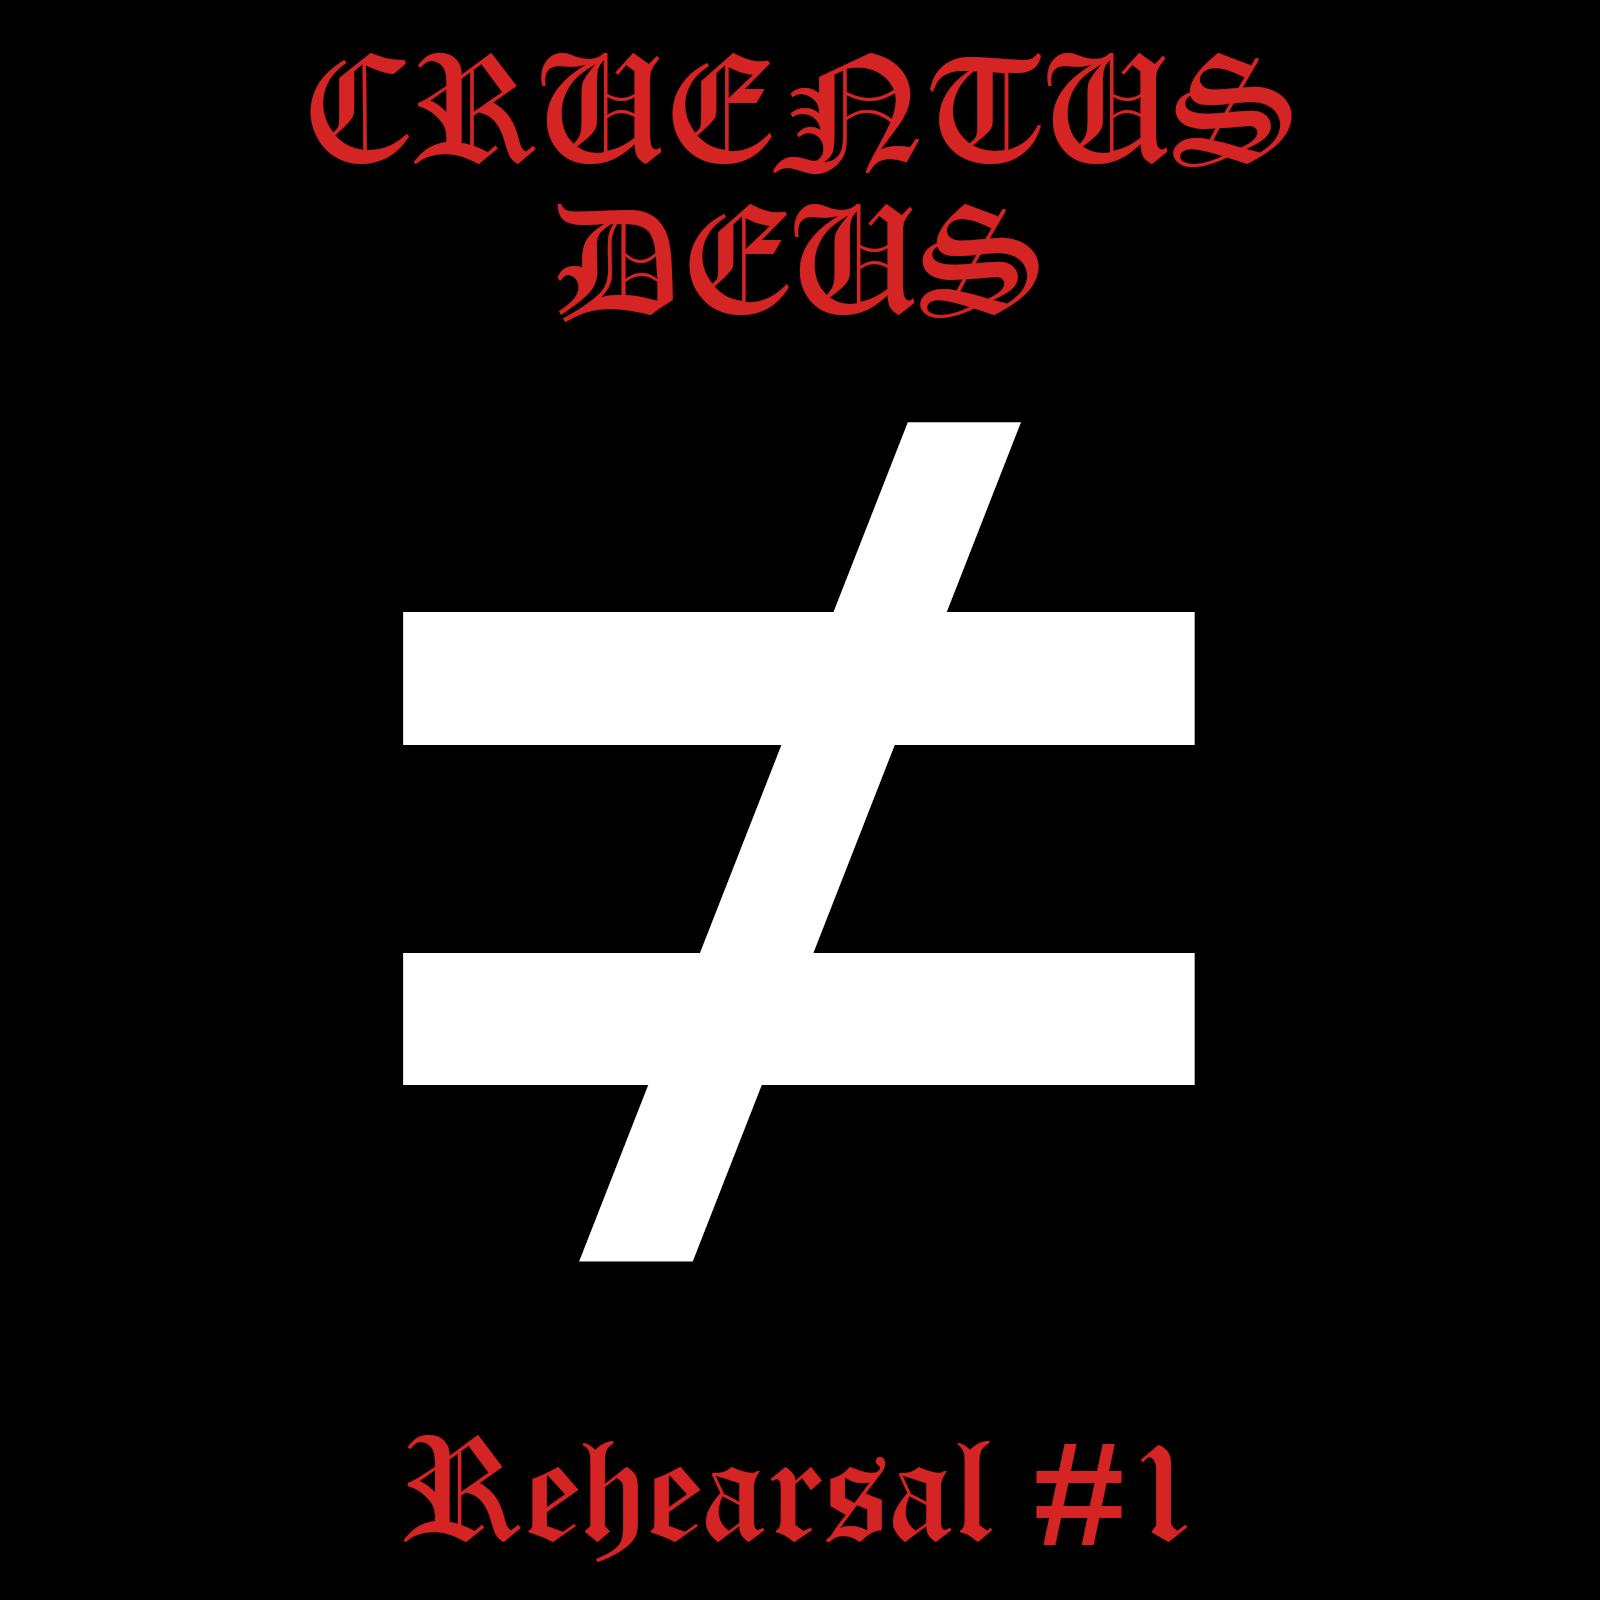 Cruentus Deus - Rehearsal #1